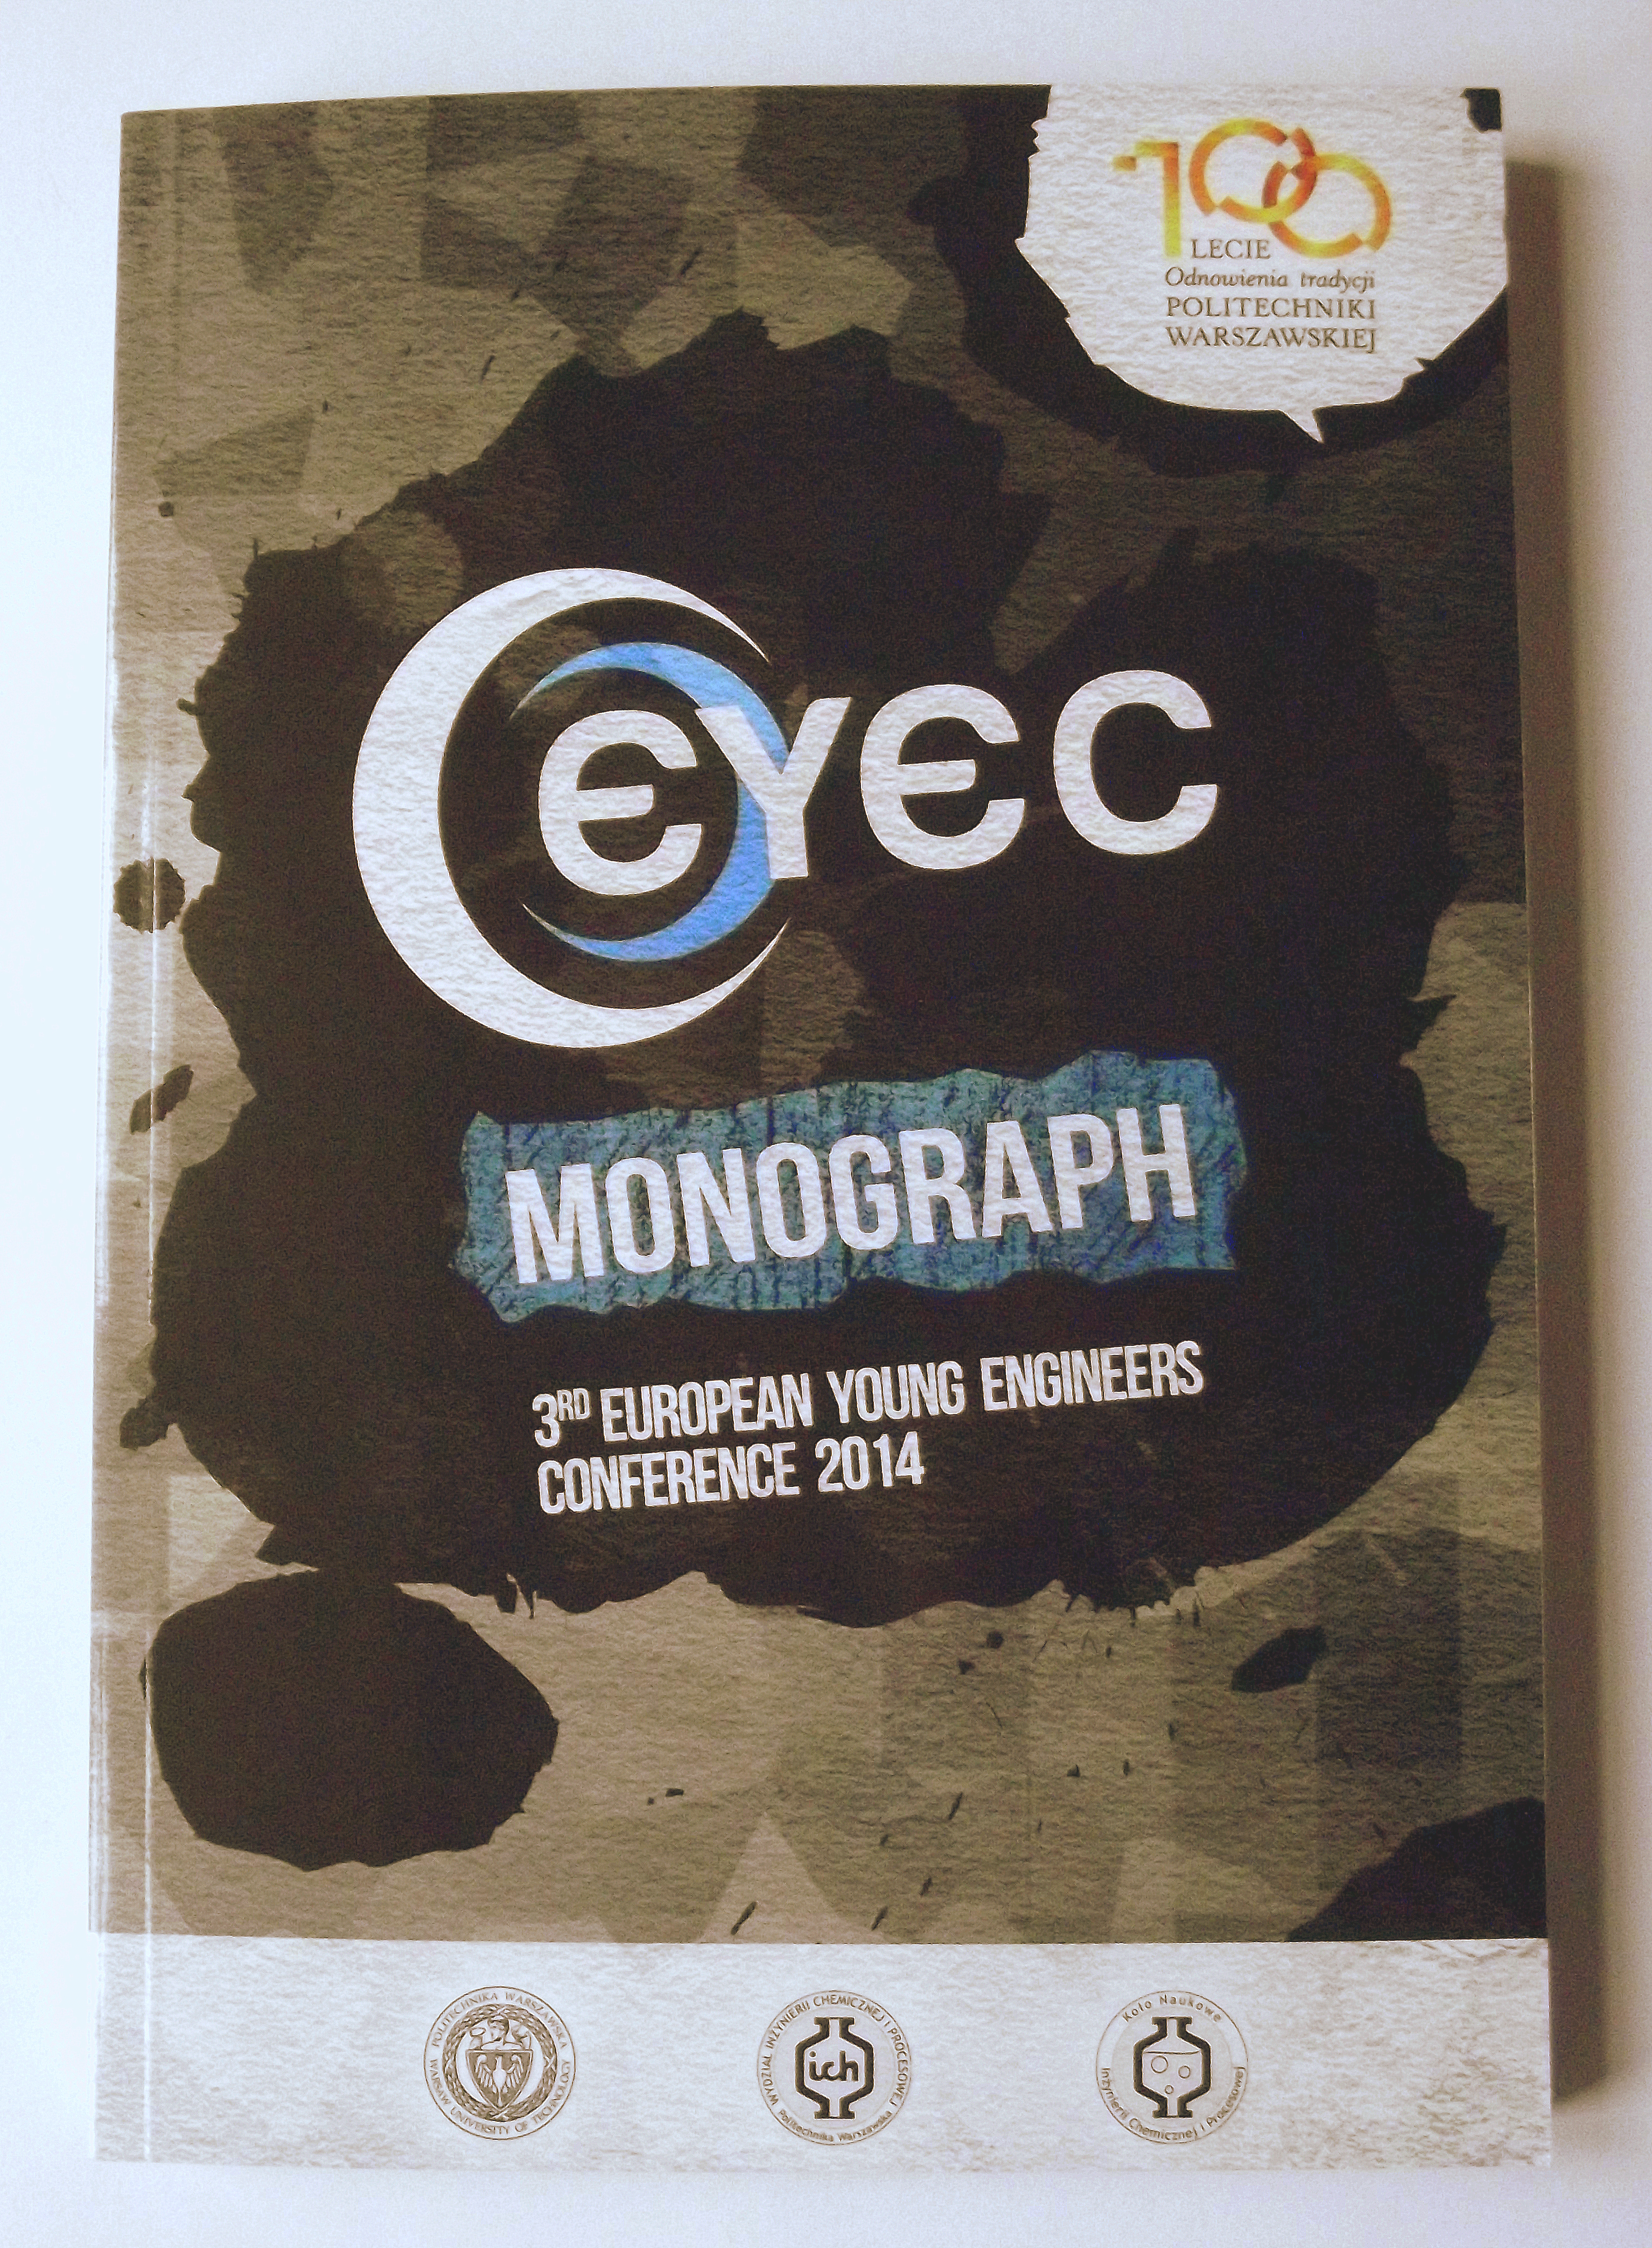 Monograph 2014